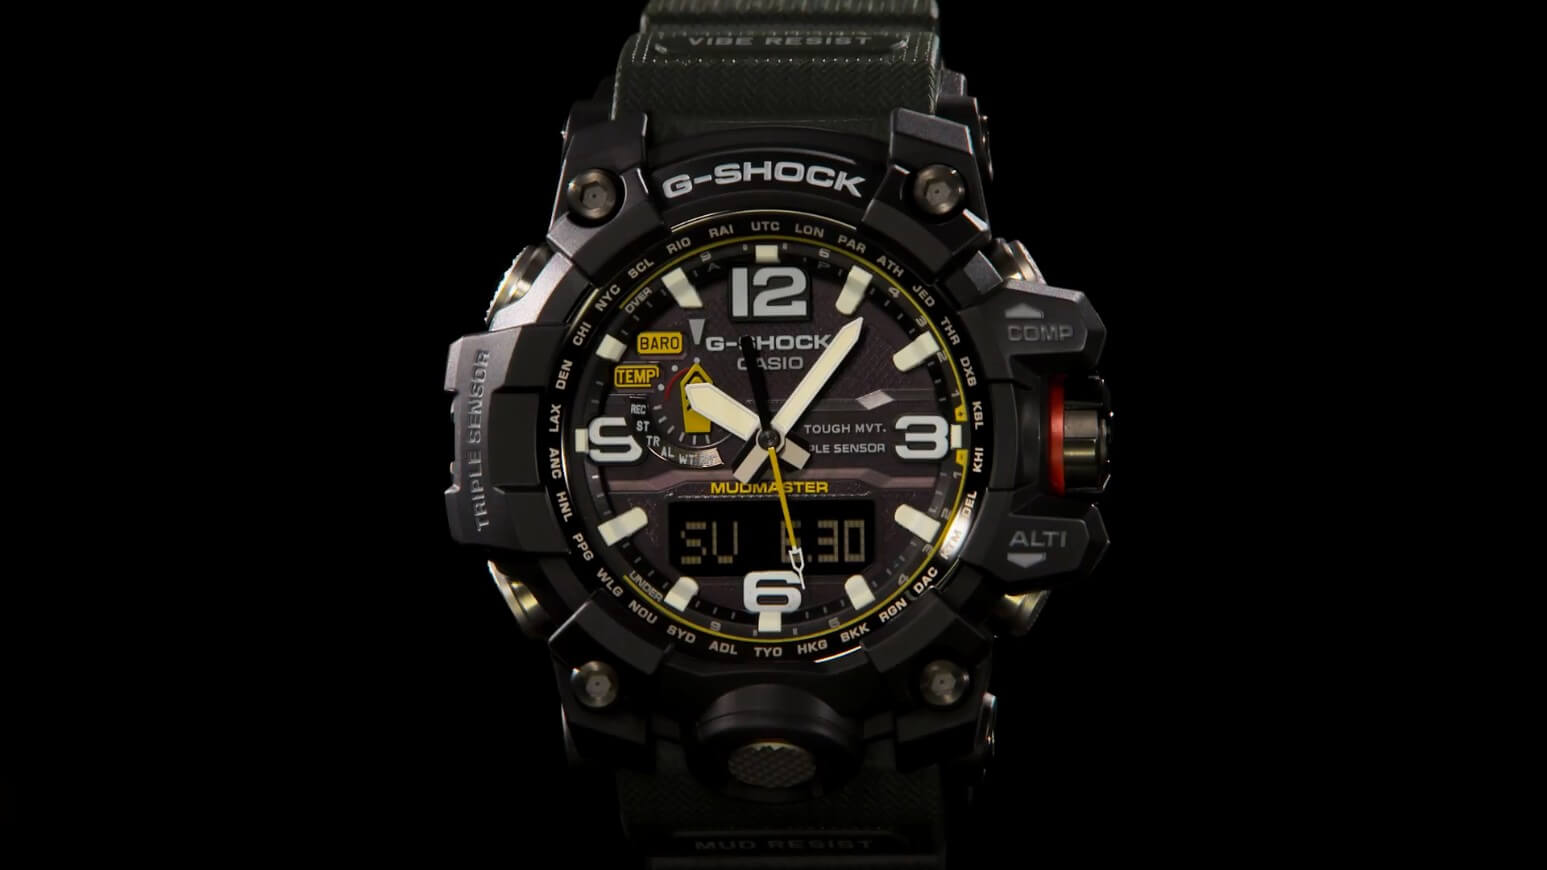 G shock 2015 model